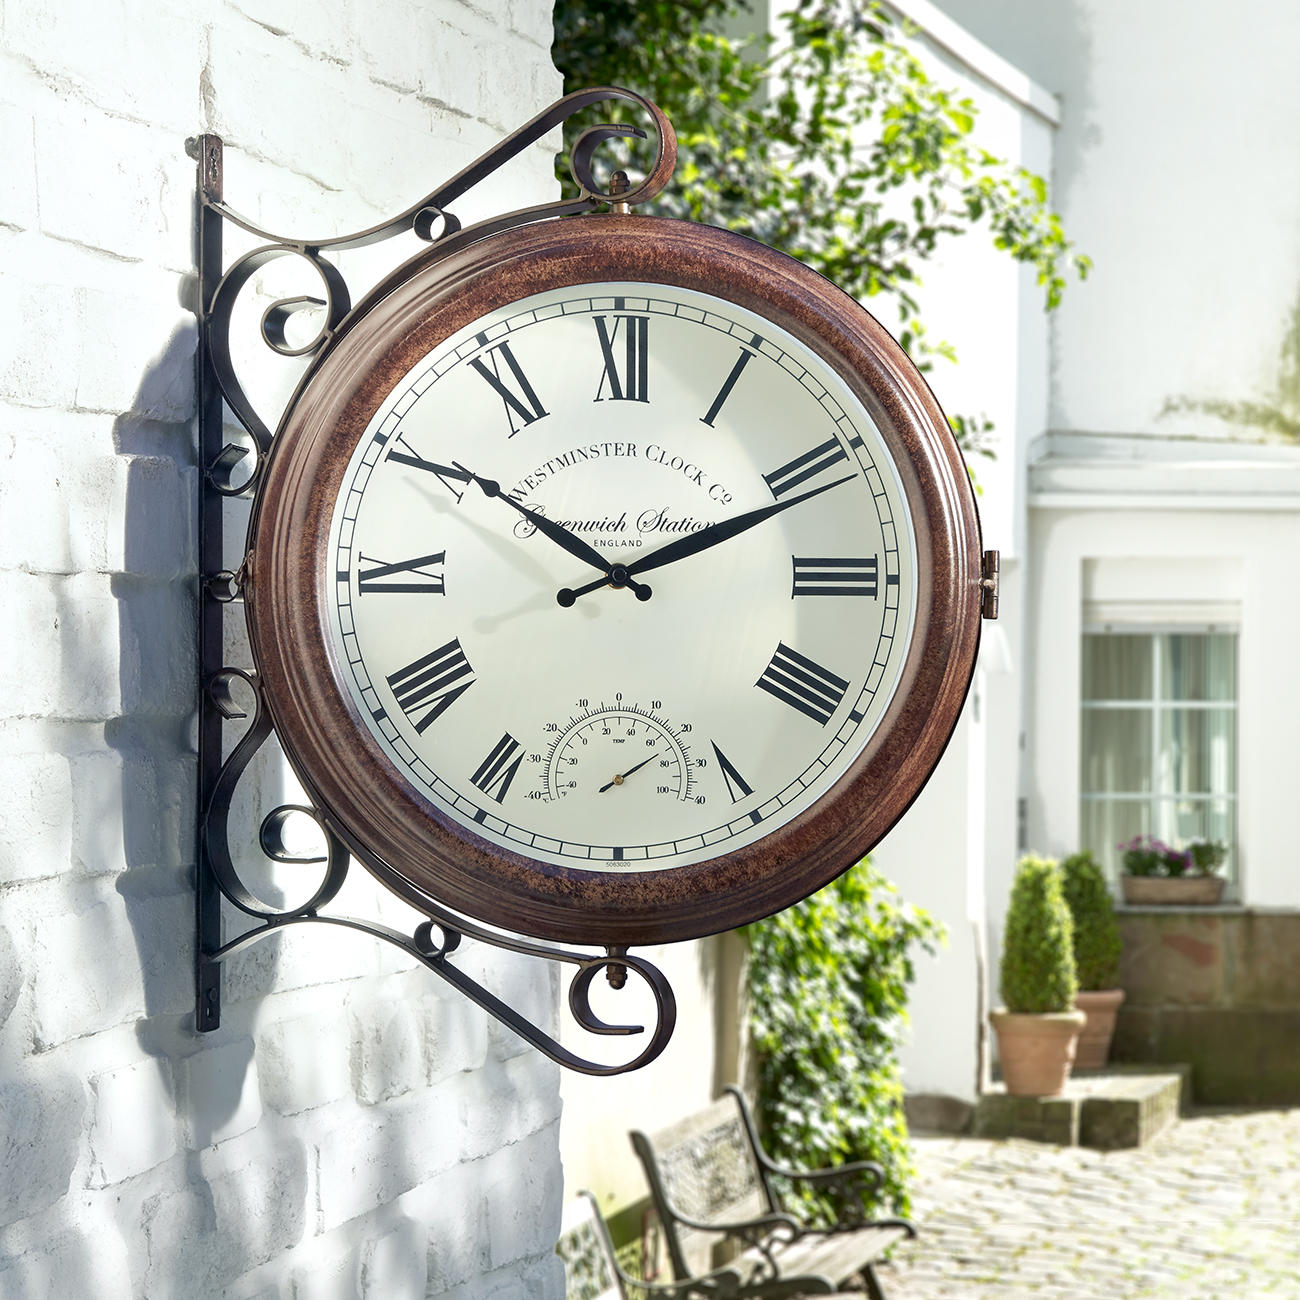 acheter horloge de jardin et de terrasse en ligne pas cher. Black Bedroom Furniture Sets. Home Design Ideas